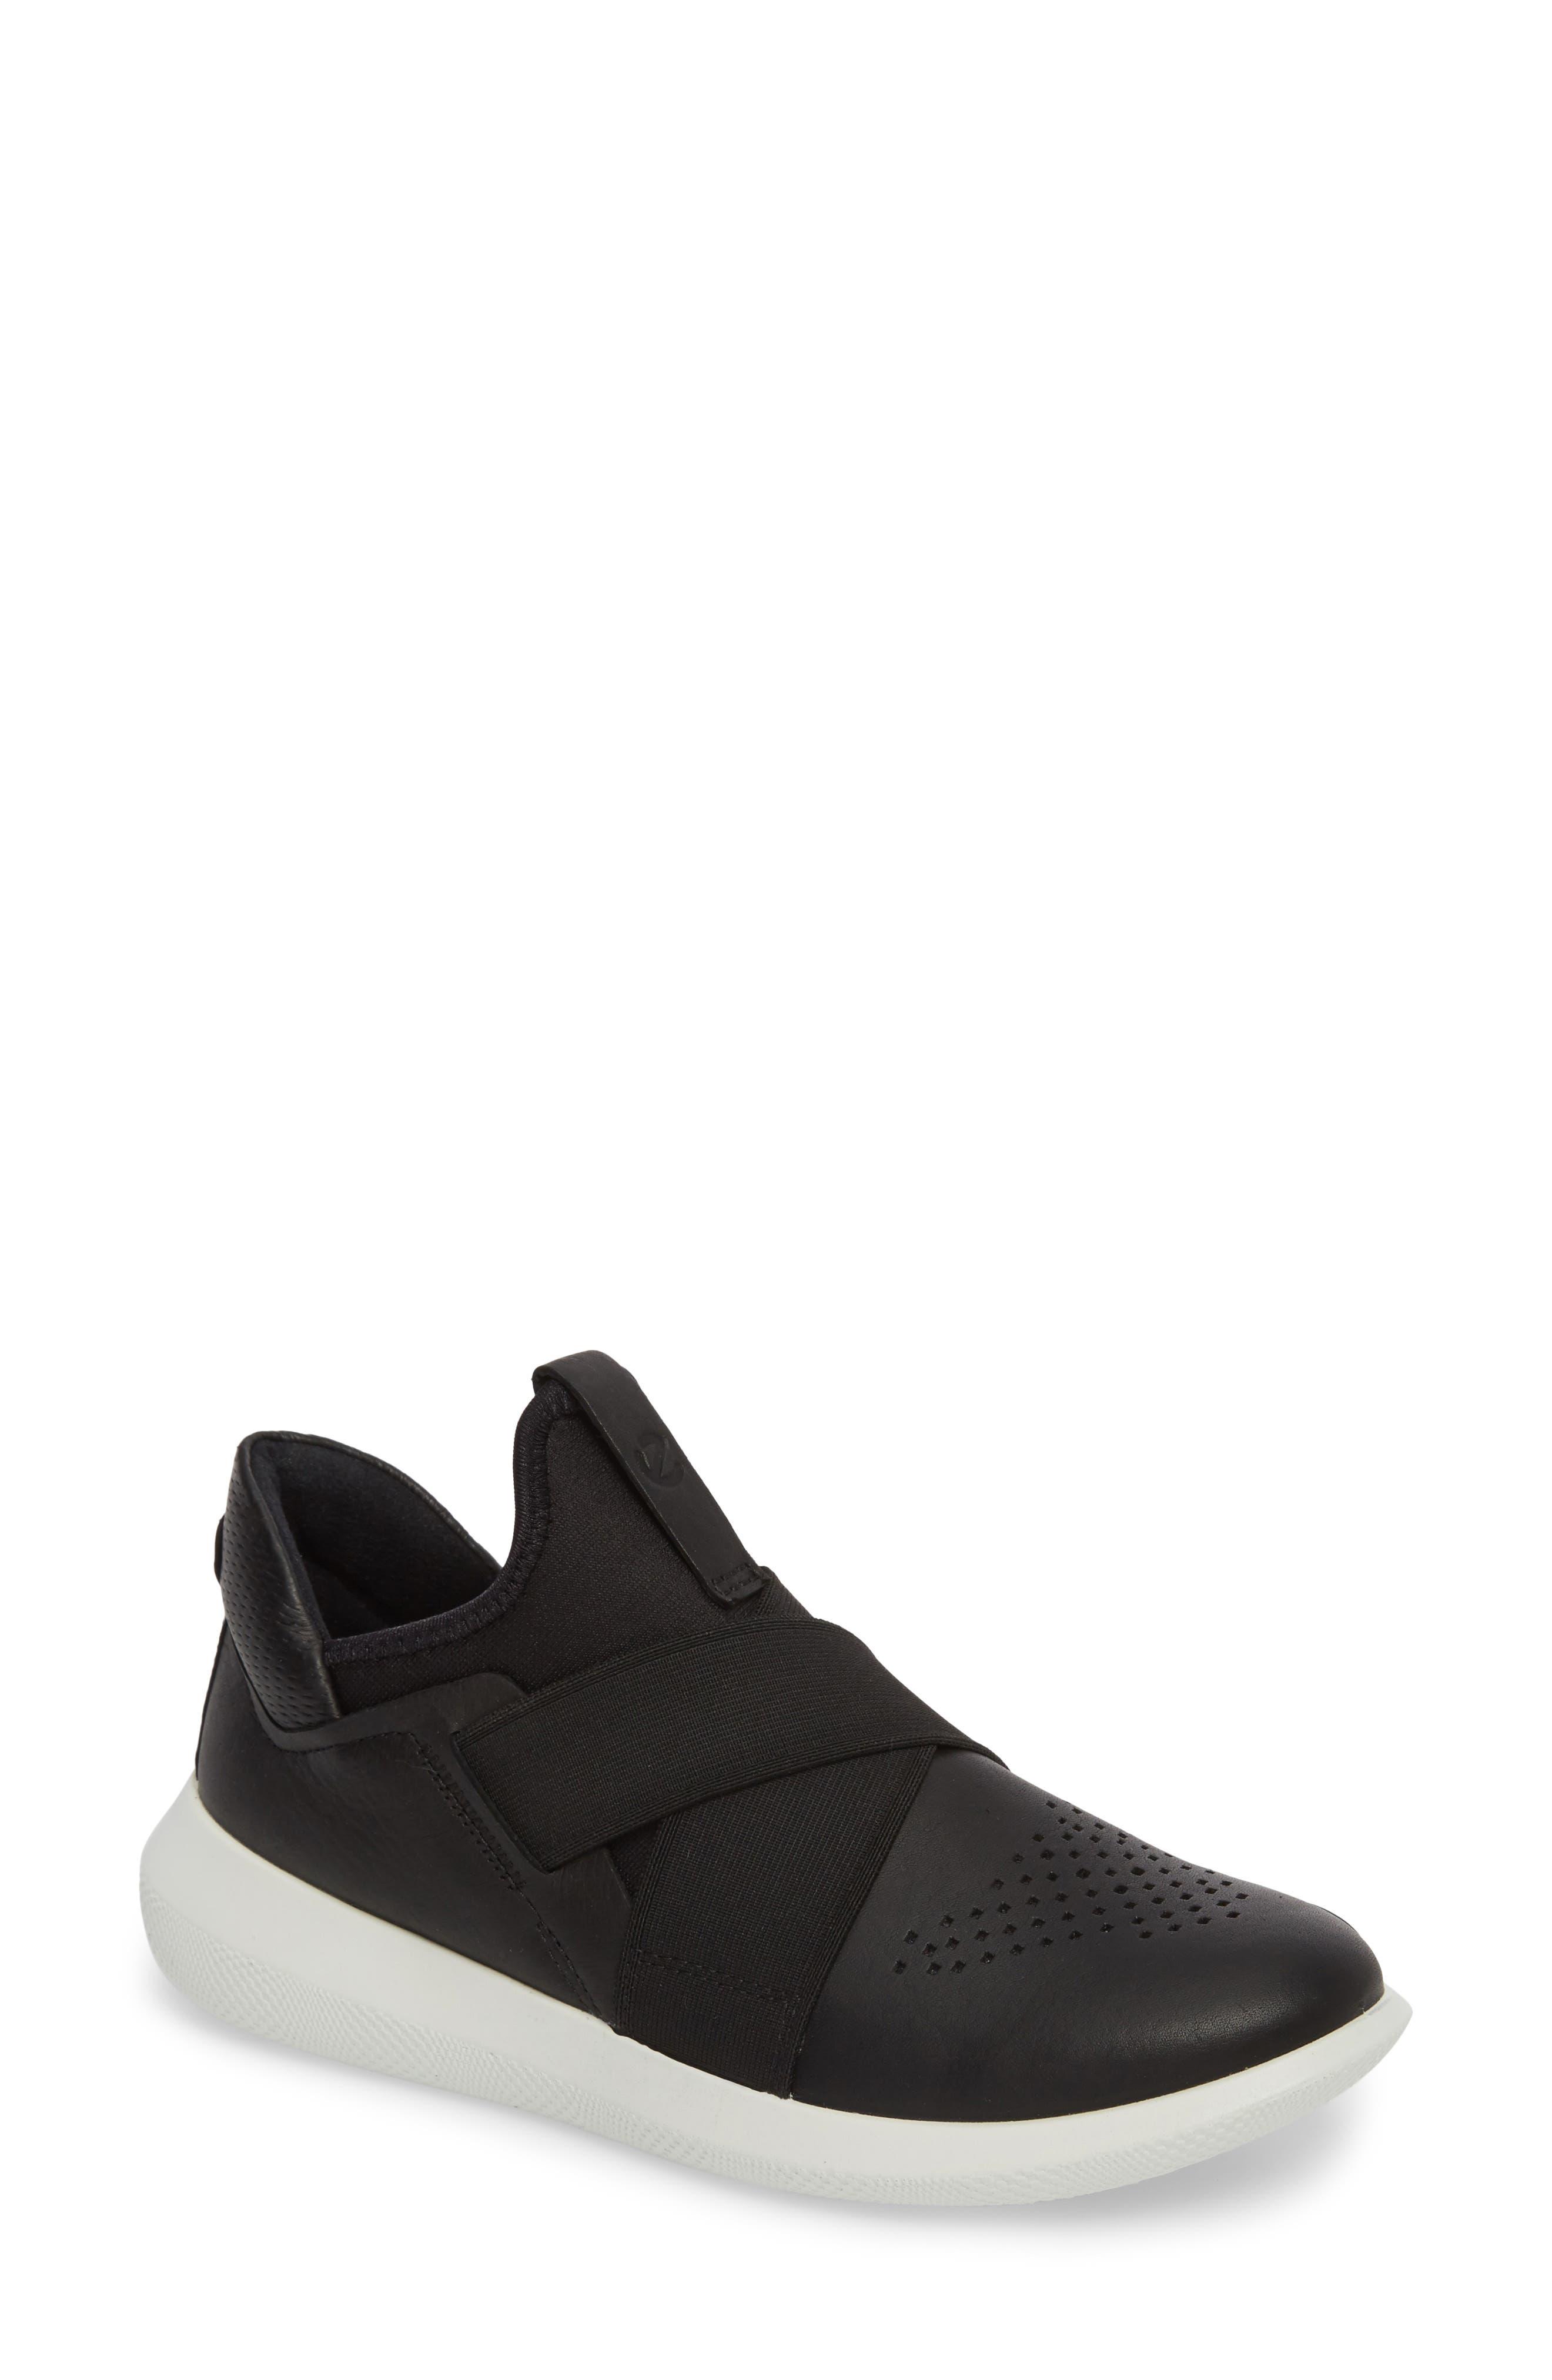 Scinapse Band Sneaker,                         Main,                         color, Black